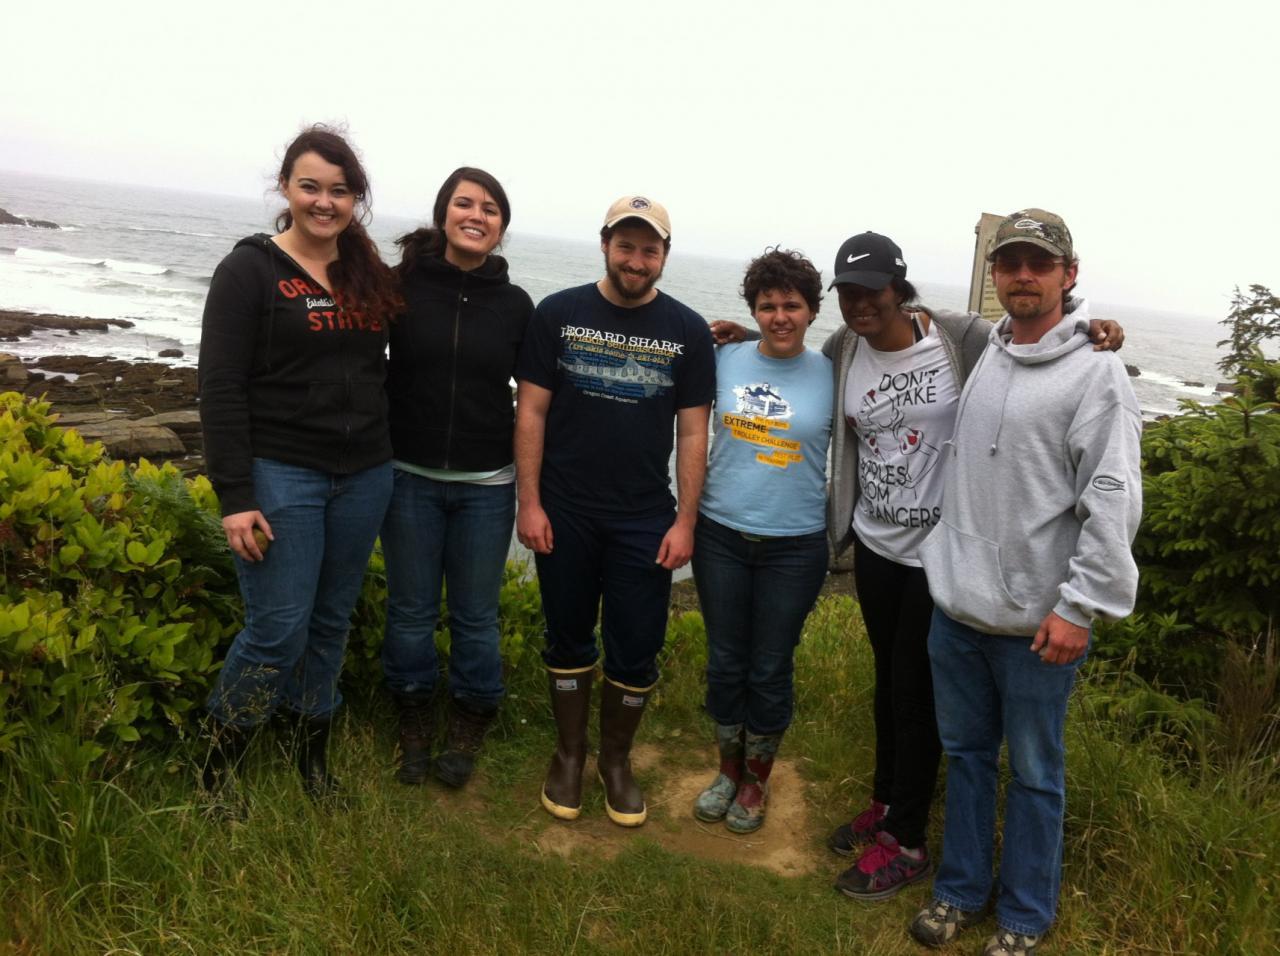 Some of the Oregon State University Coastal Society